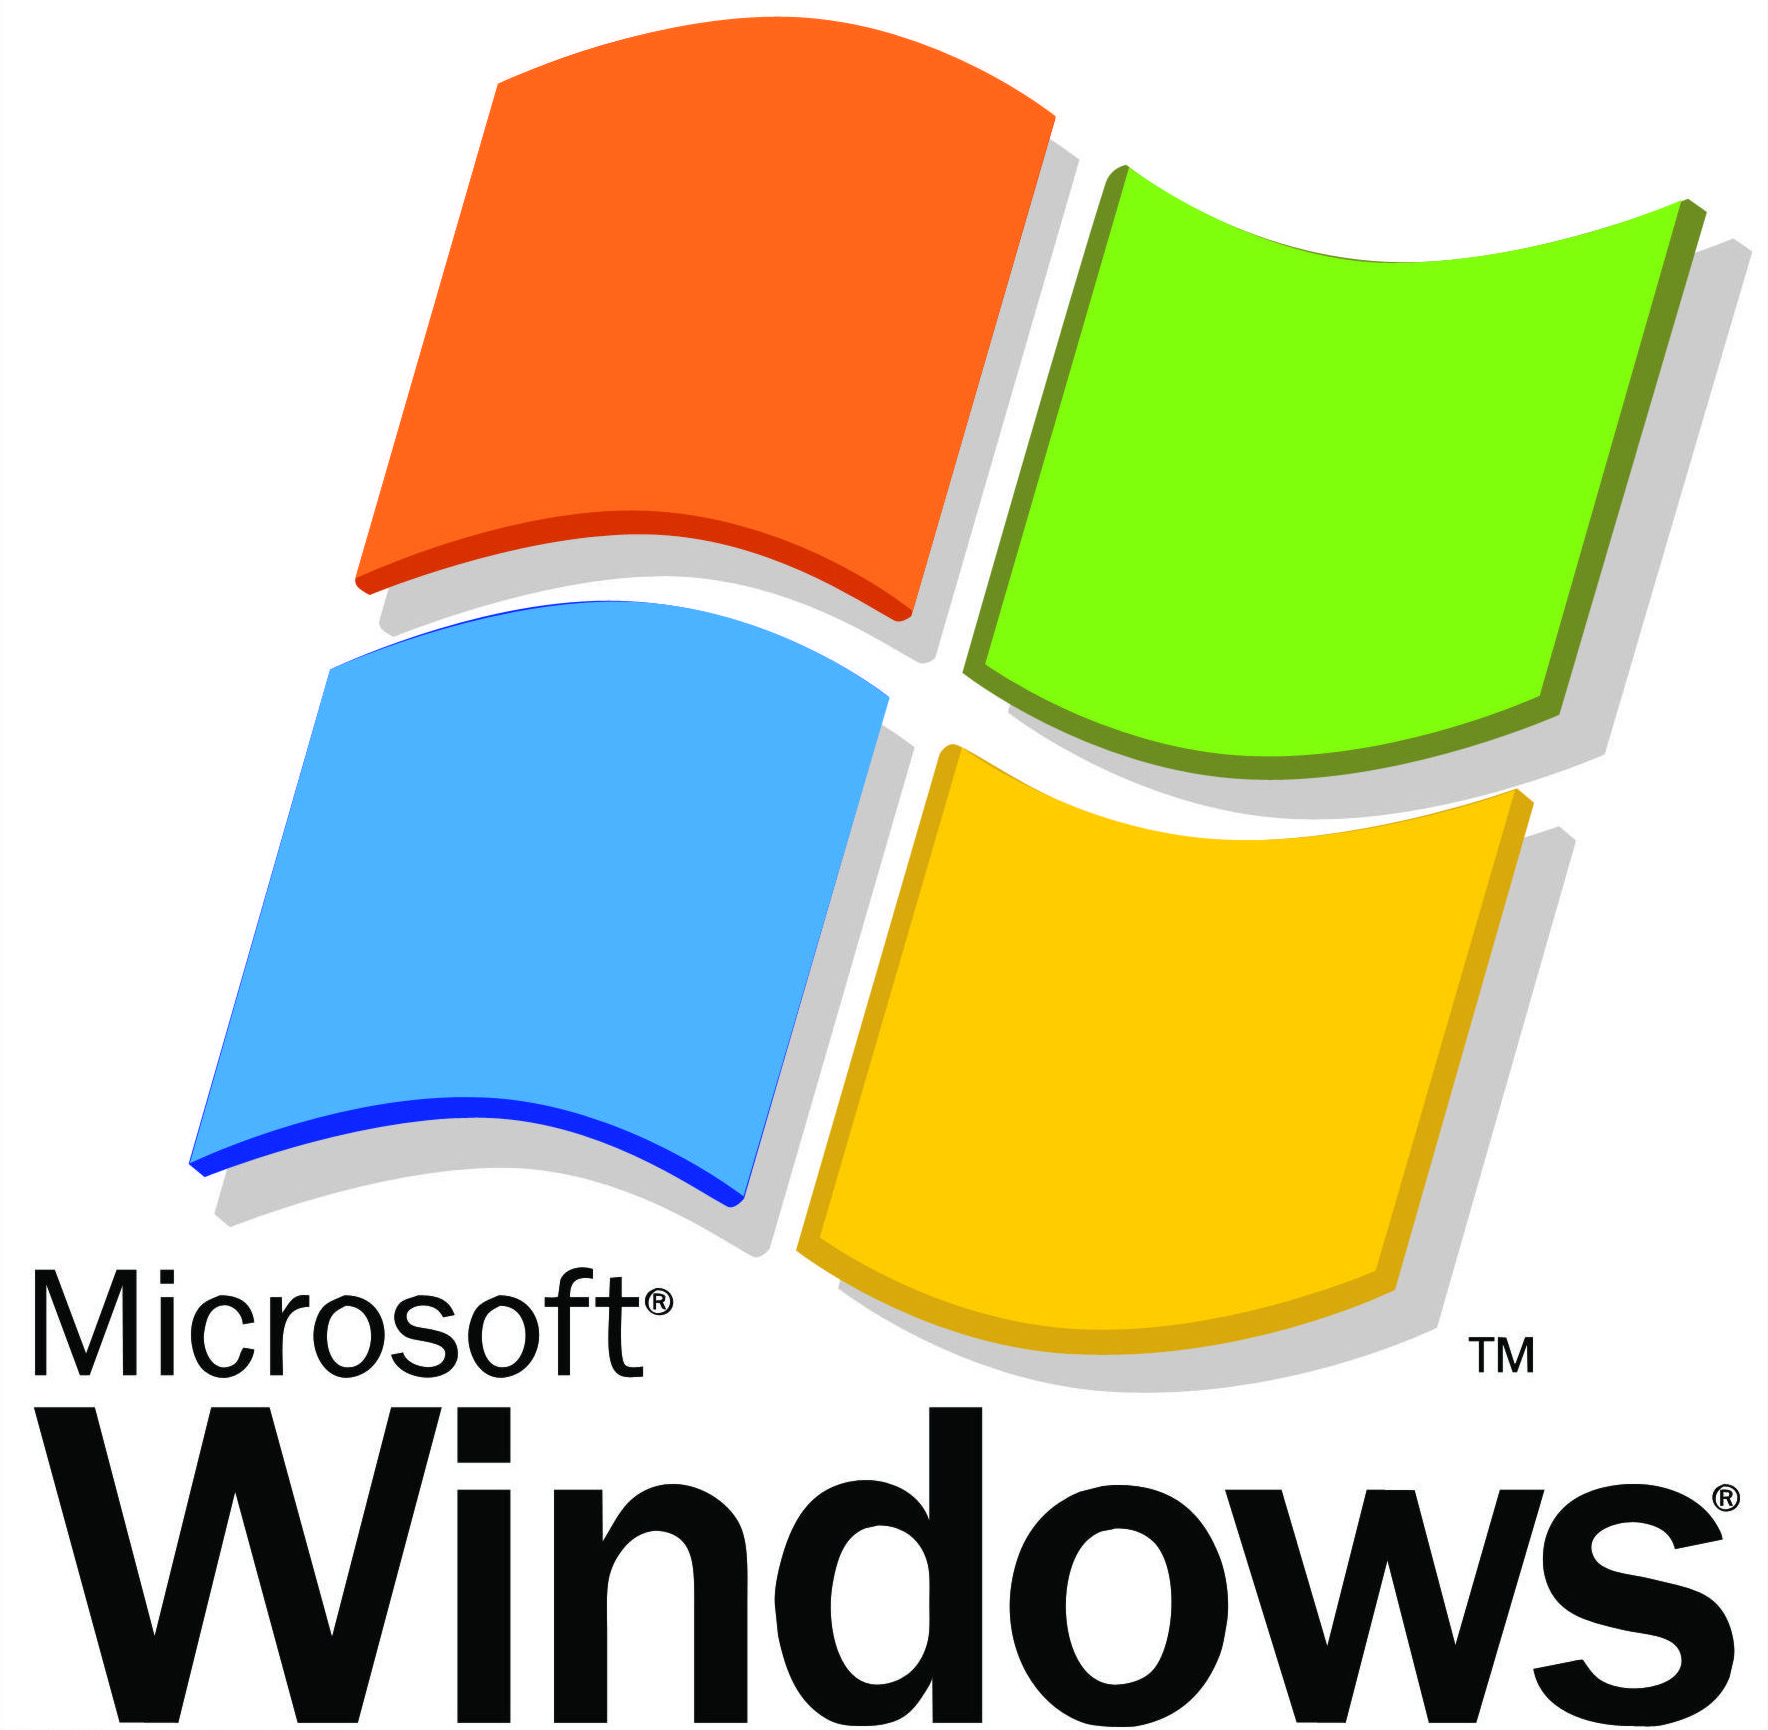 14 microsoft windows logo designs images microsoft